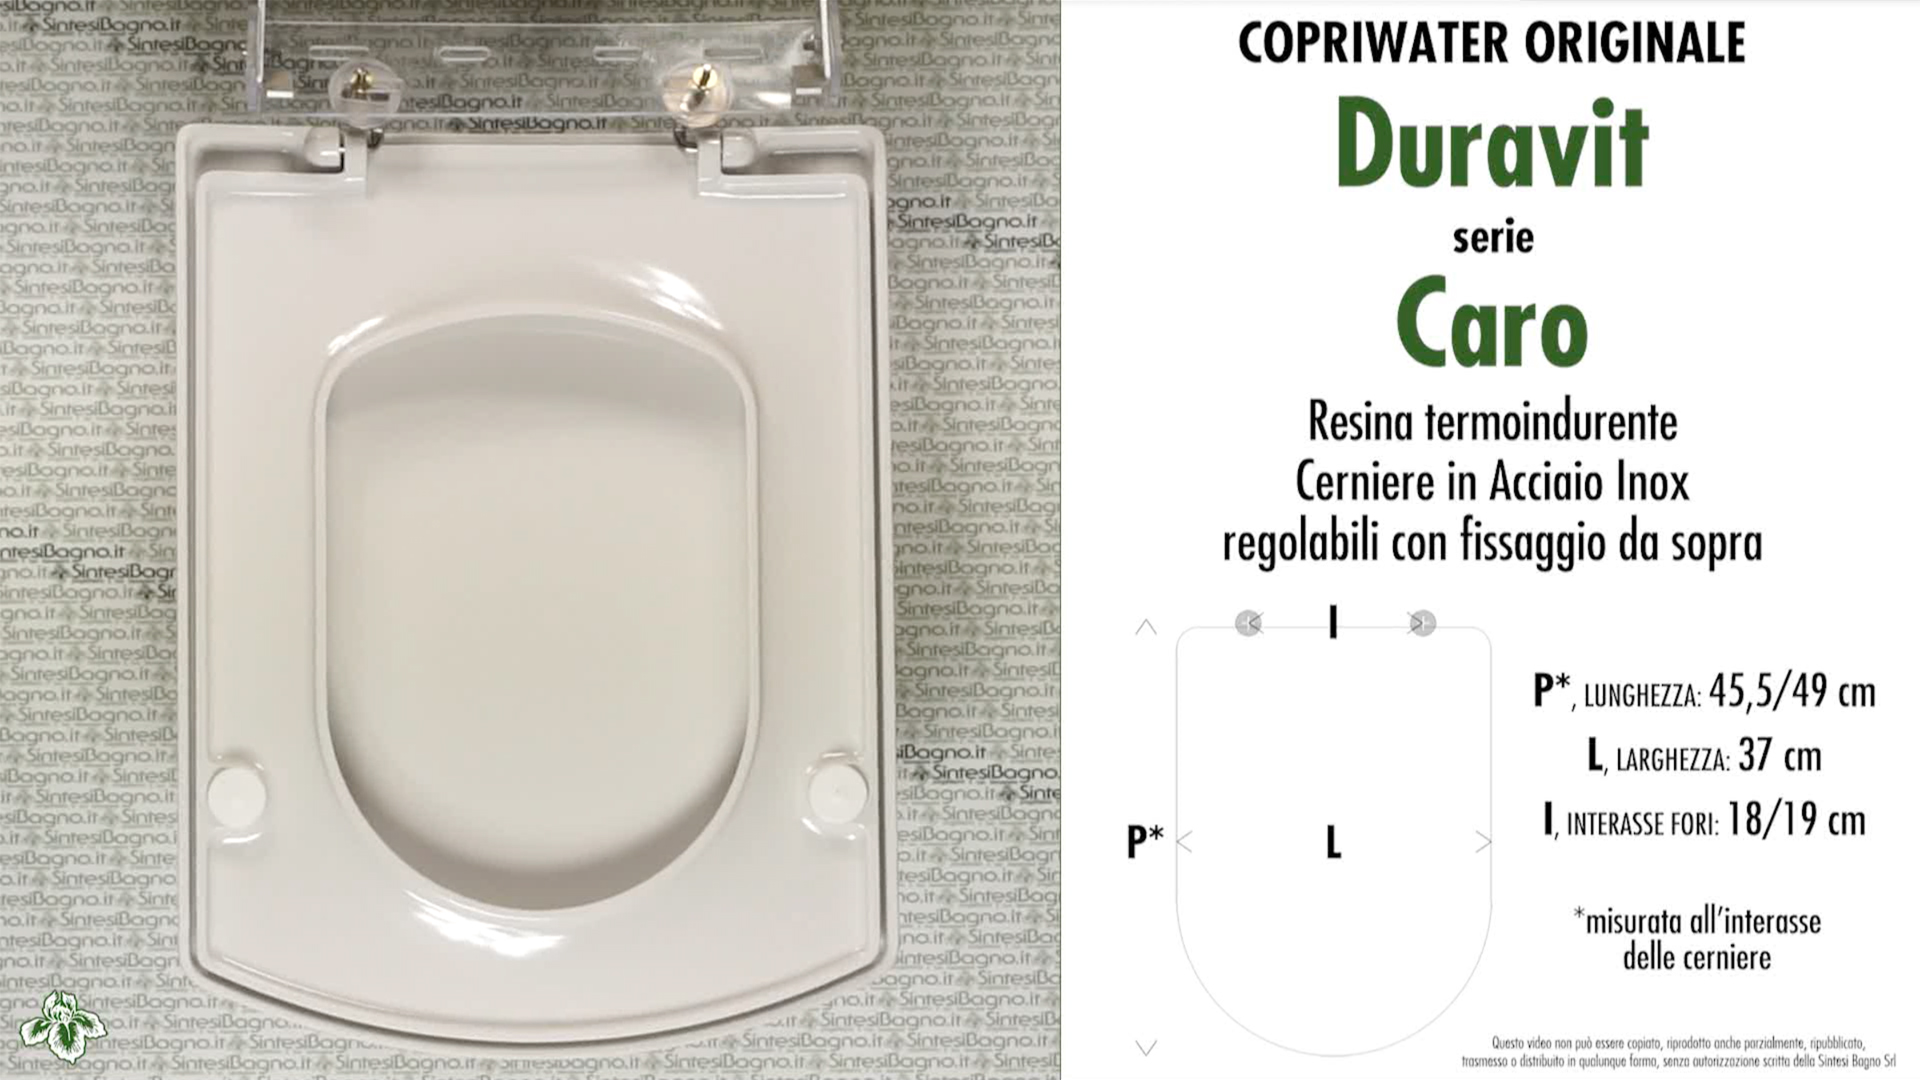 SCHEDA TECNICA MISURE copriwater LAUFEN/DURAVIT CARO